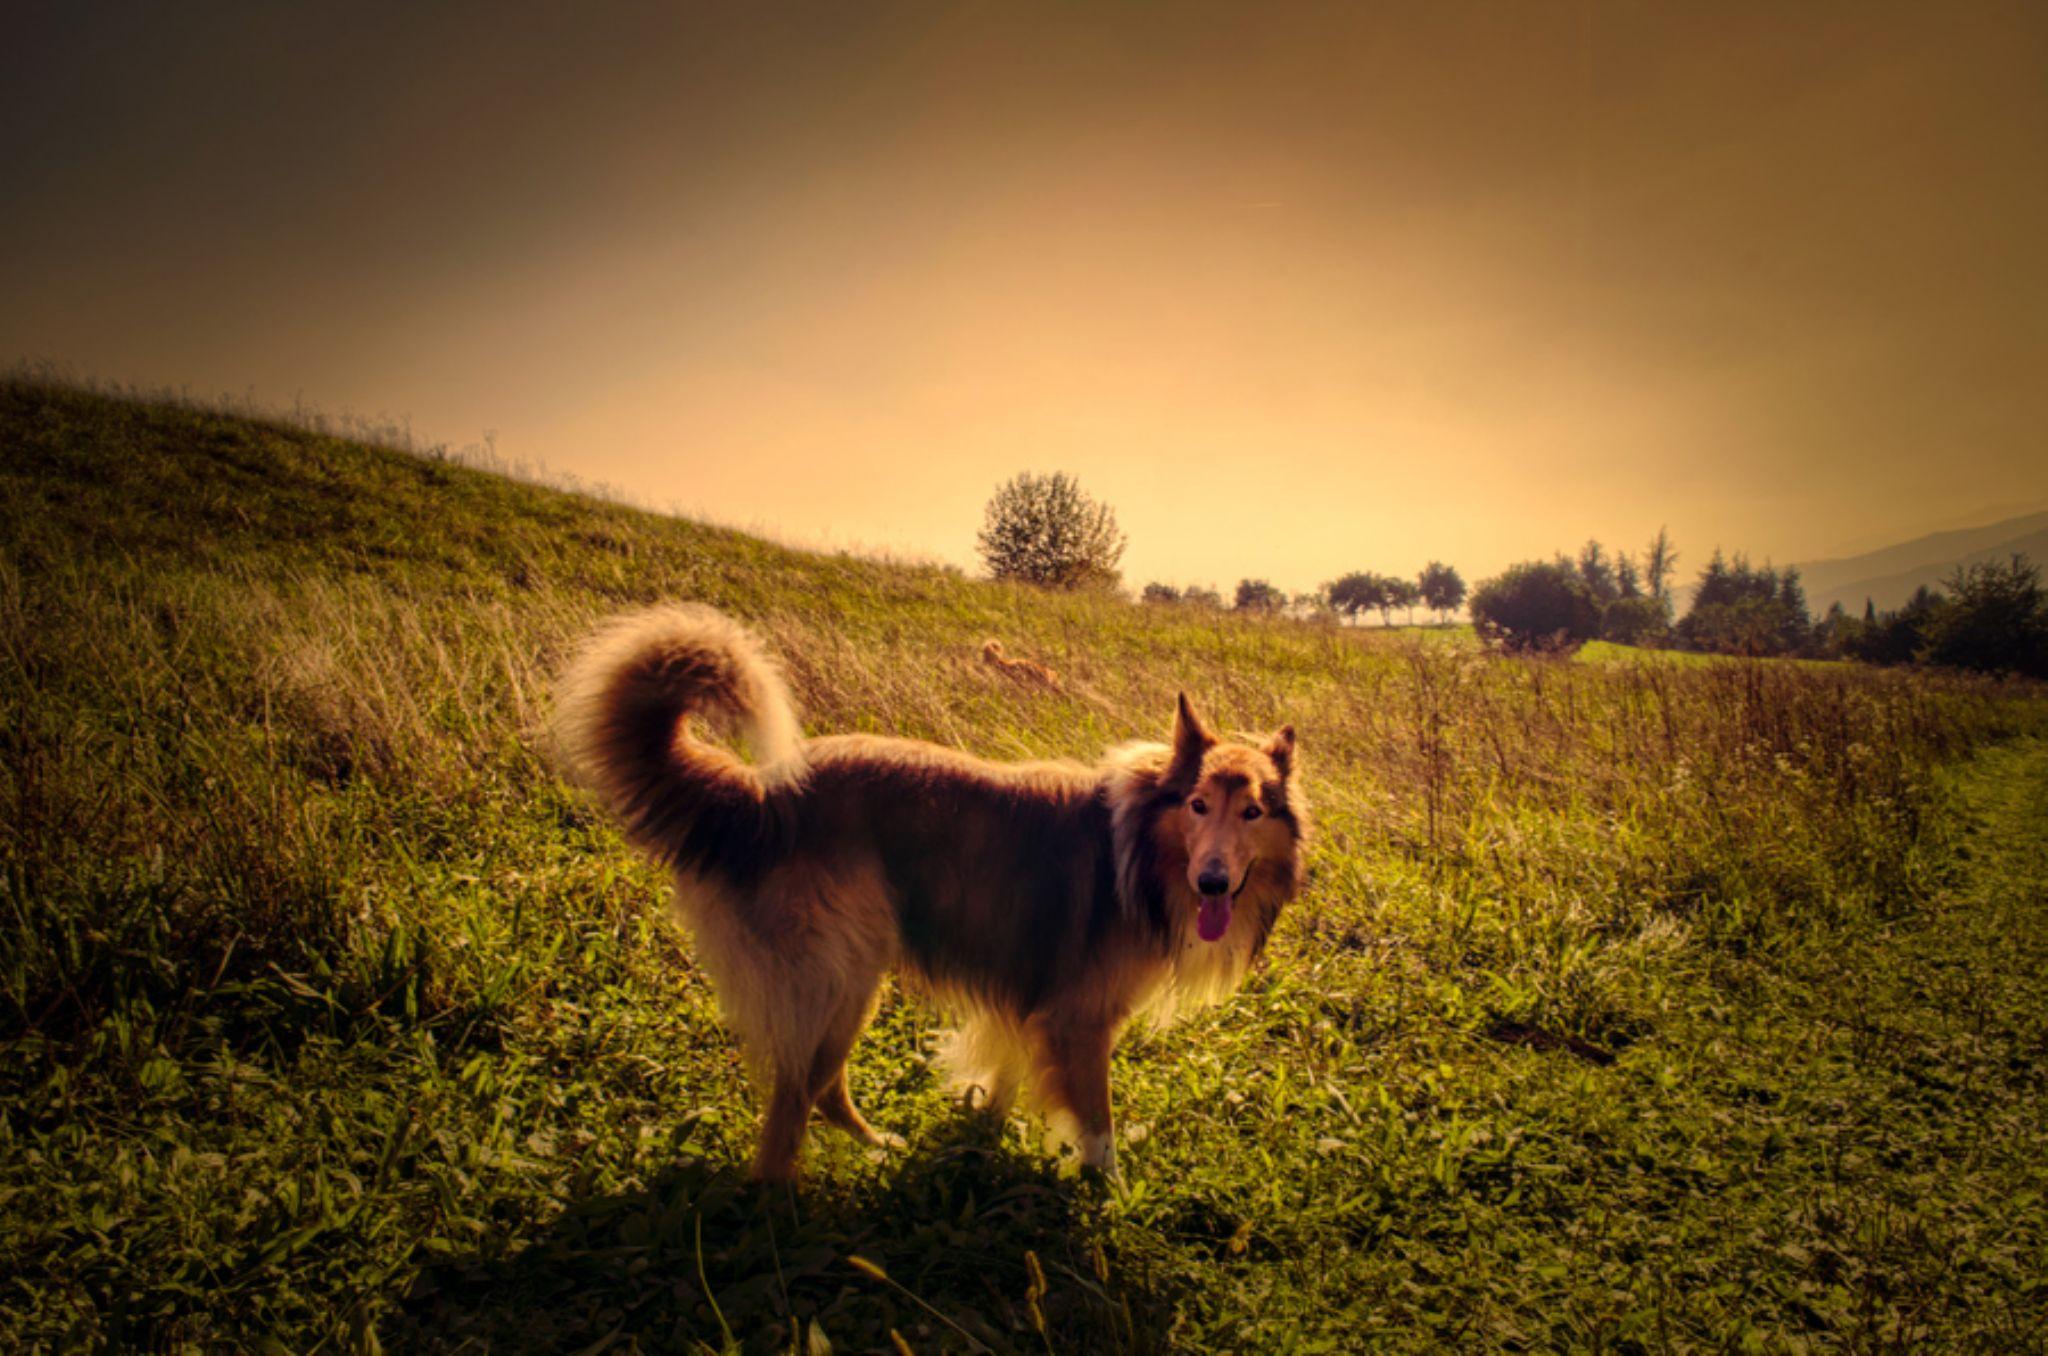 Lassie Come-Home by LuGiais